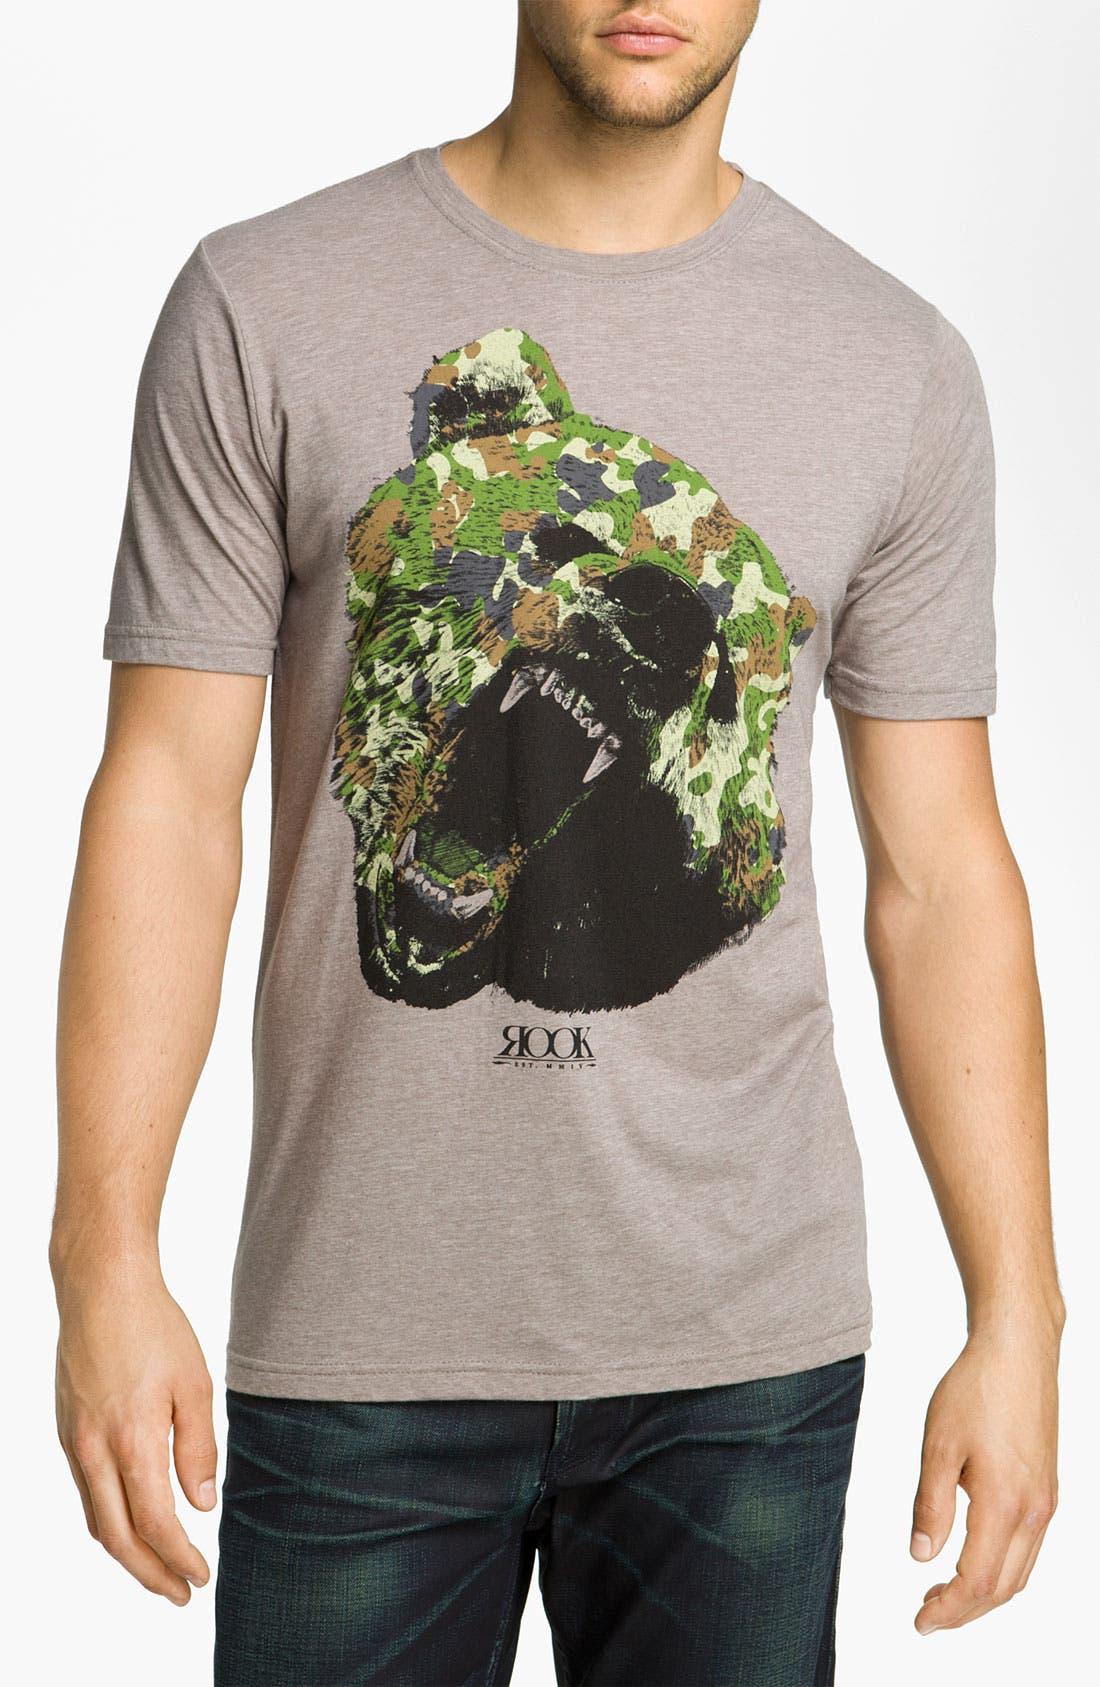 Alternate Image 1 Selected - Rook 'Camo Bear' Graphic T-Shirt